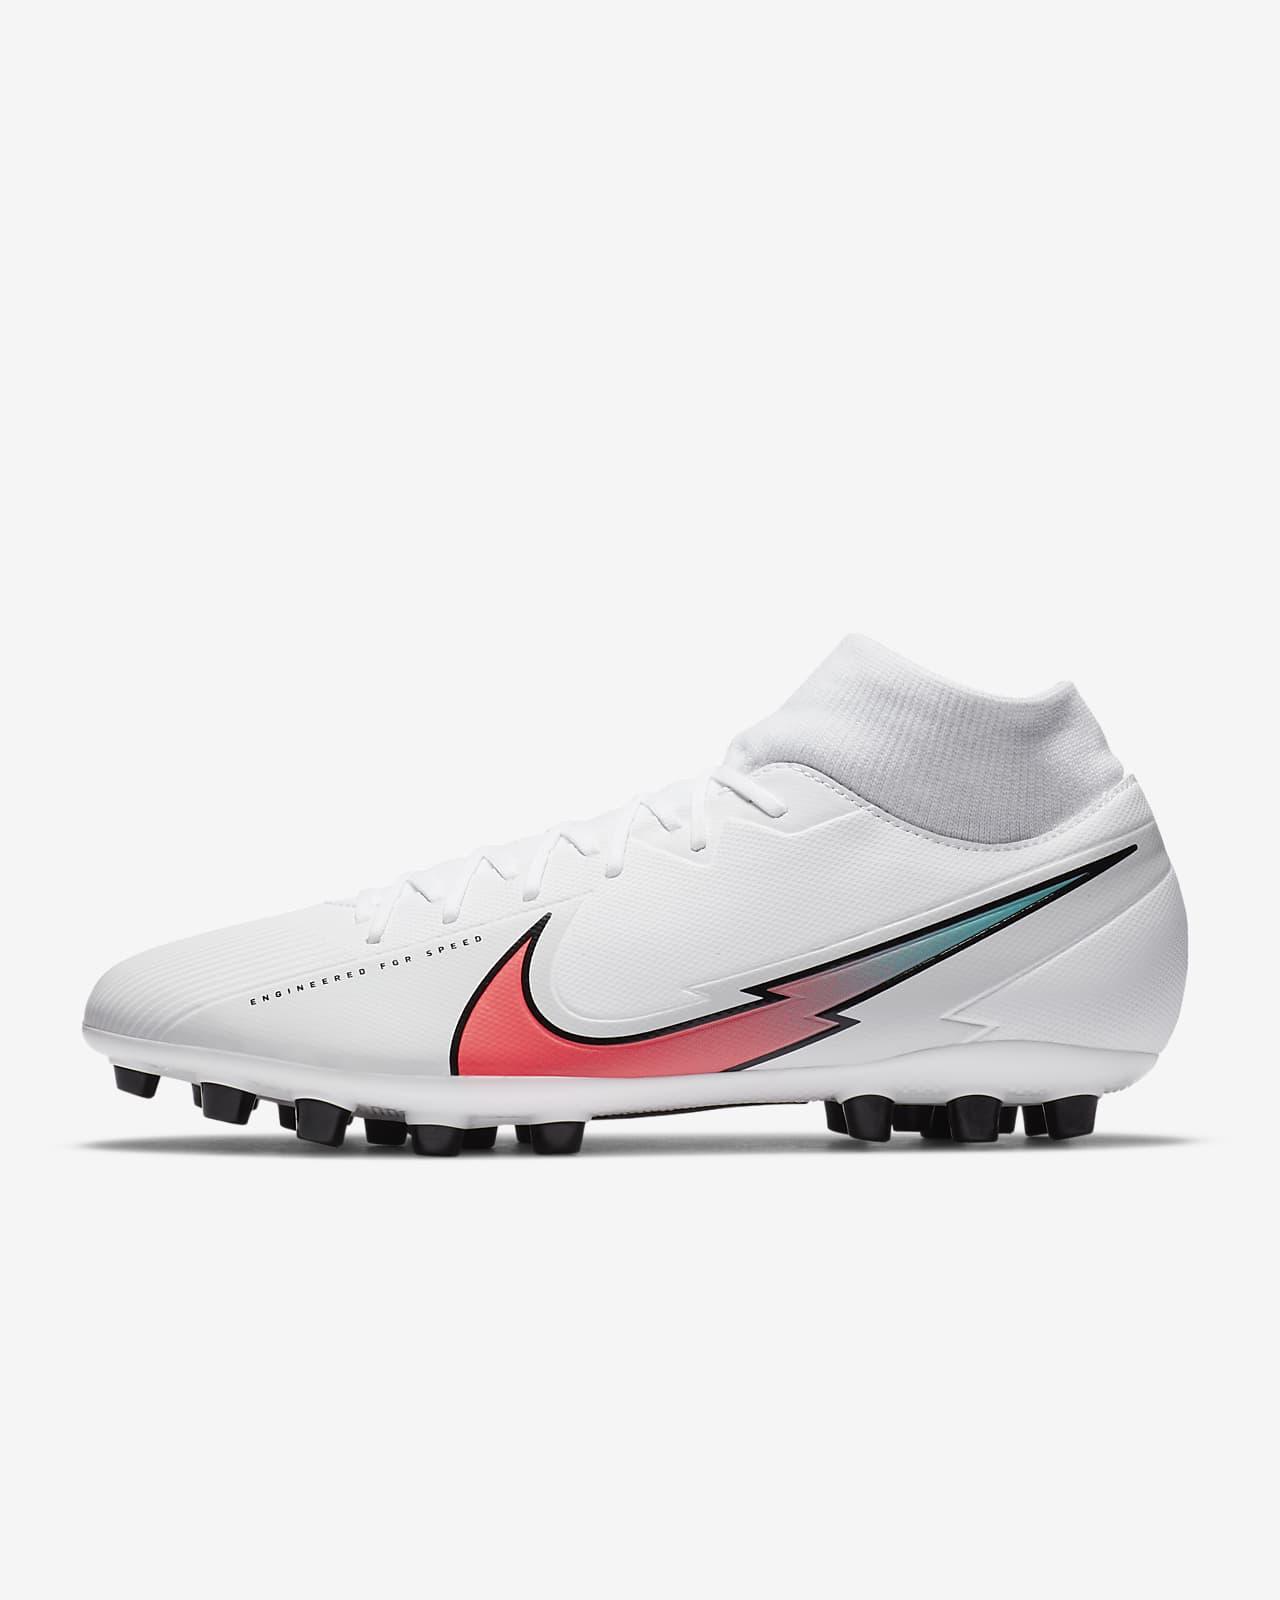 Nike Mercurial Superfly 7 Academy AG Artificial-Grass Football Boot